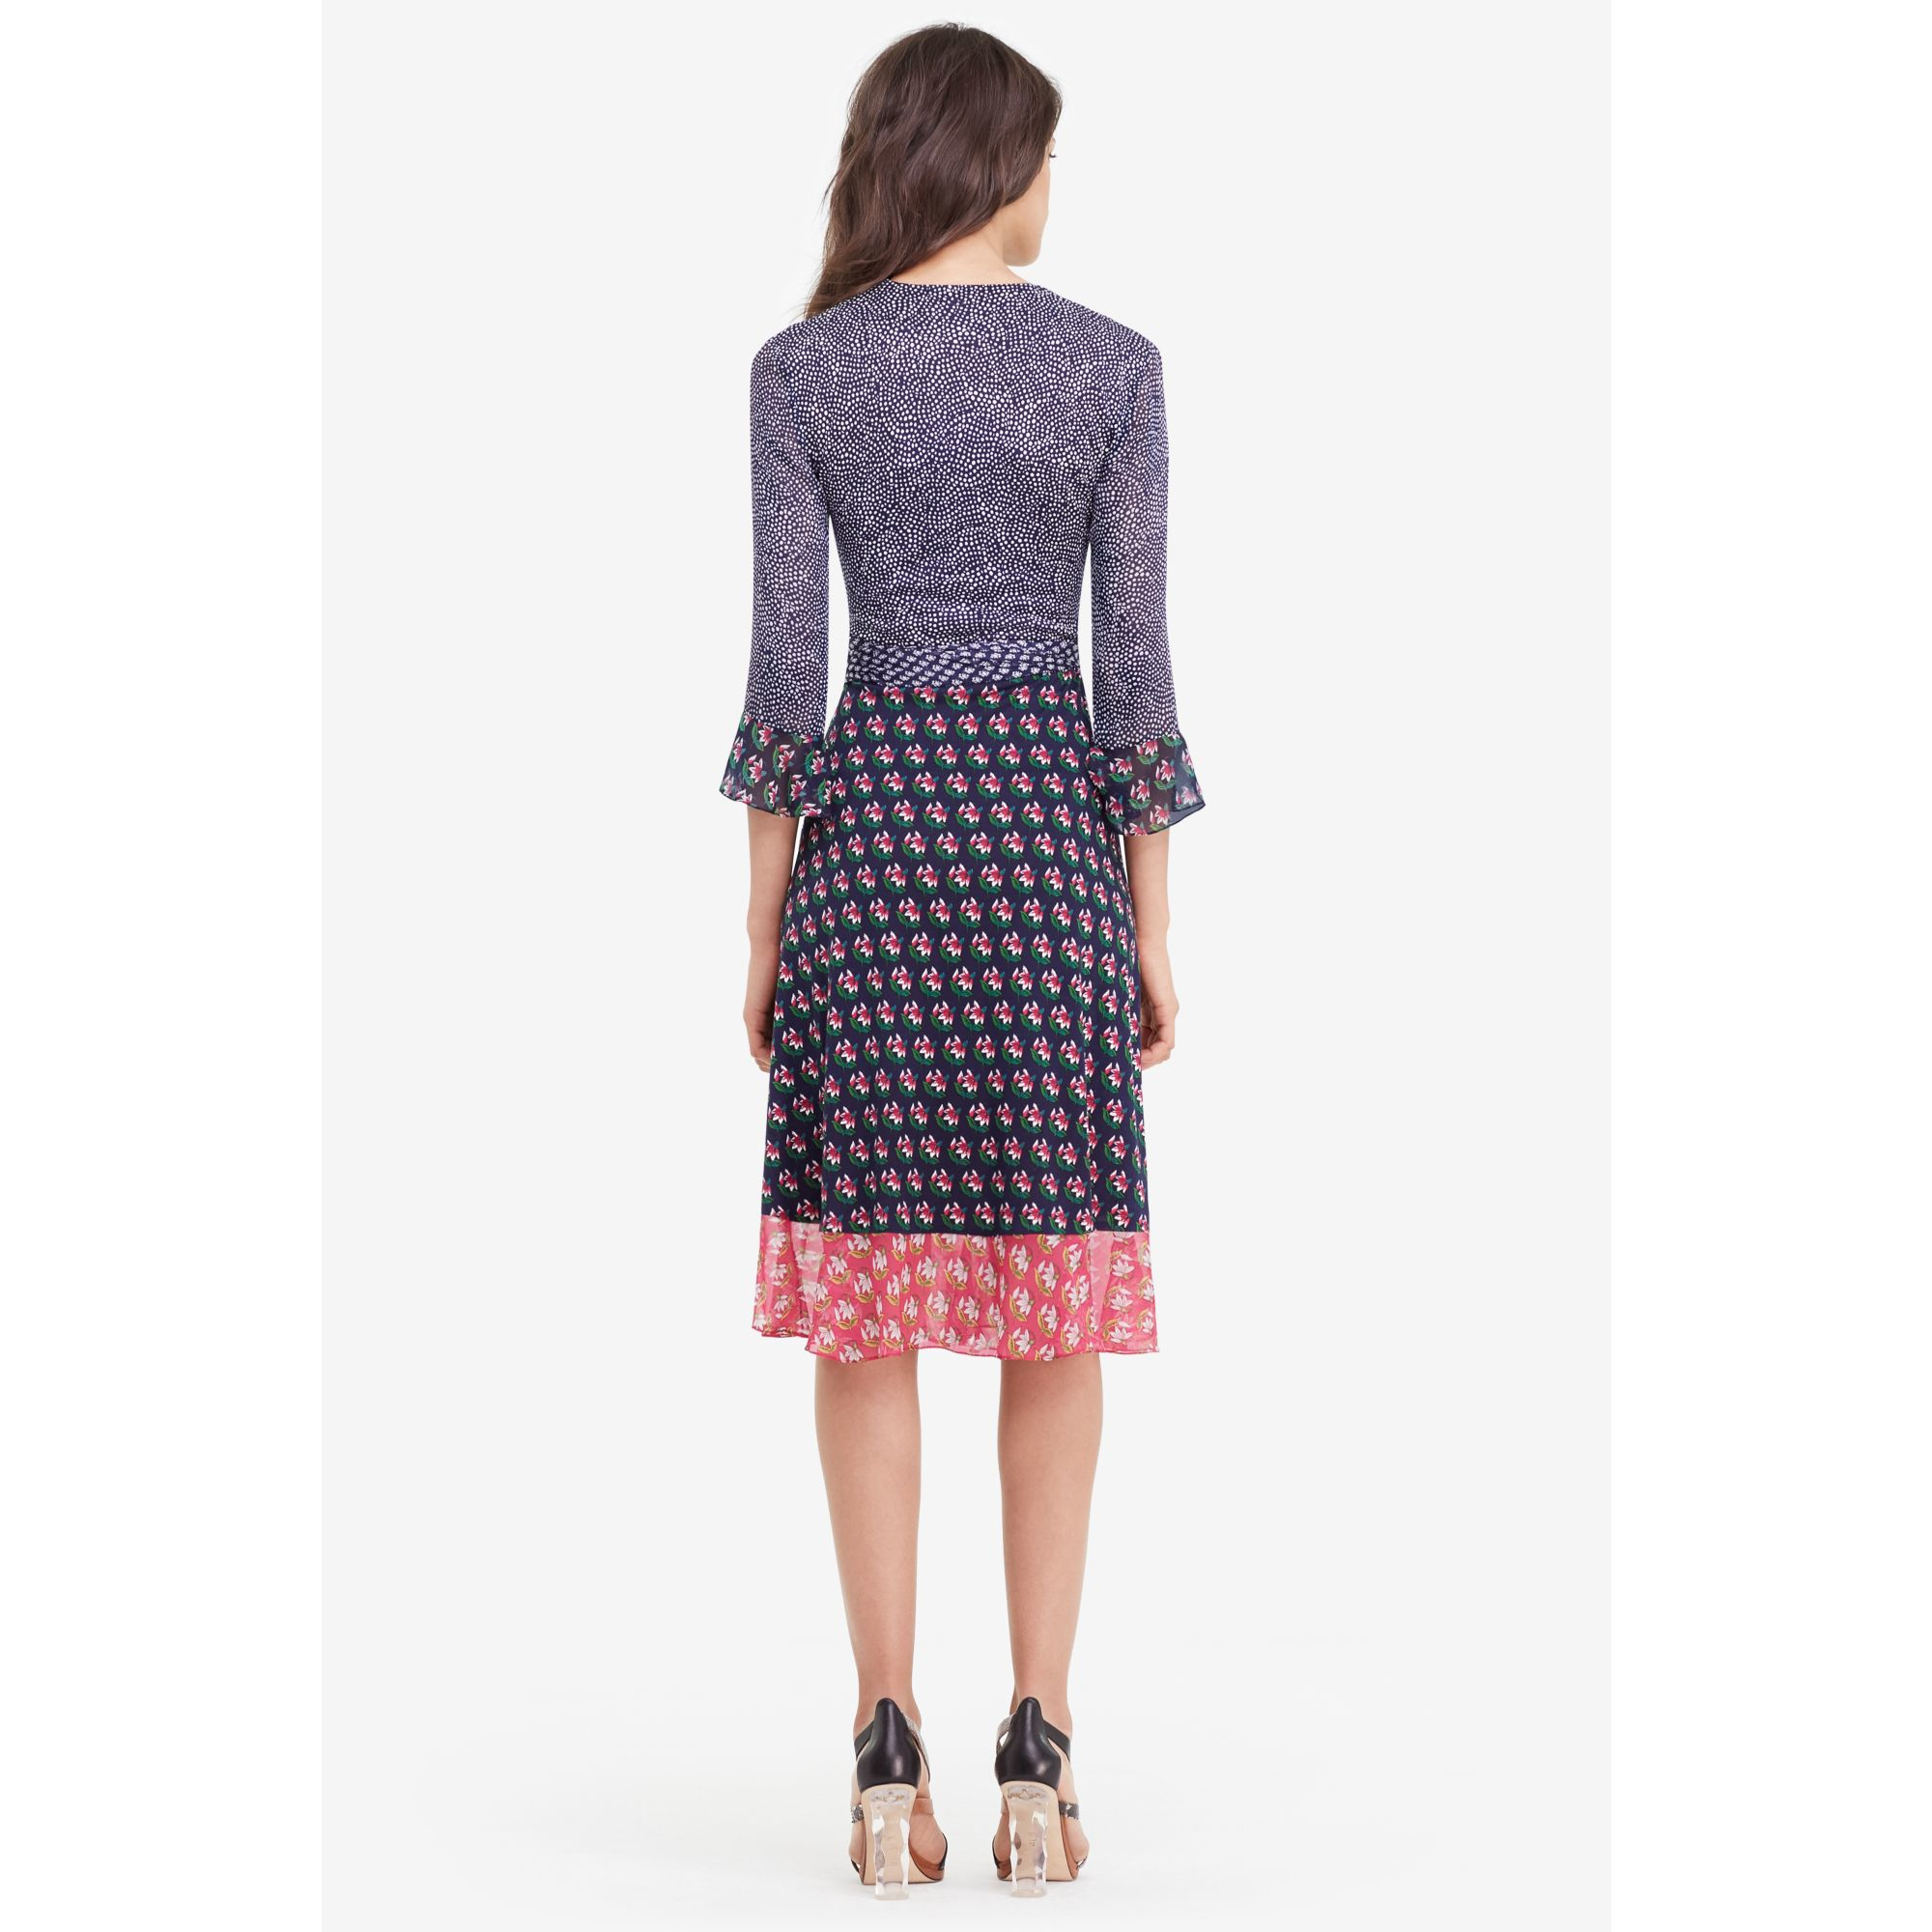 45fdf26a703b Diane von Furstenberg Nieves Silk and Chiffon Wrap Dress - Lyst